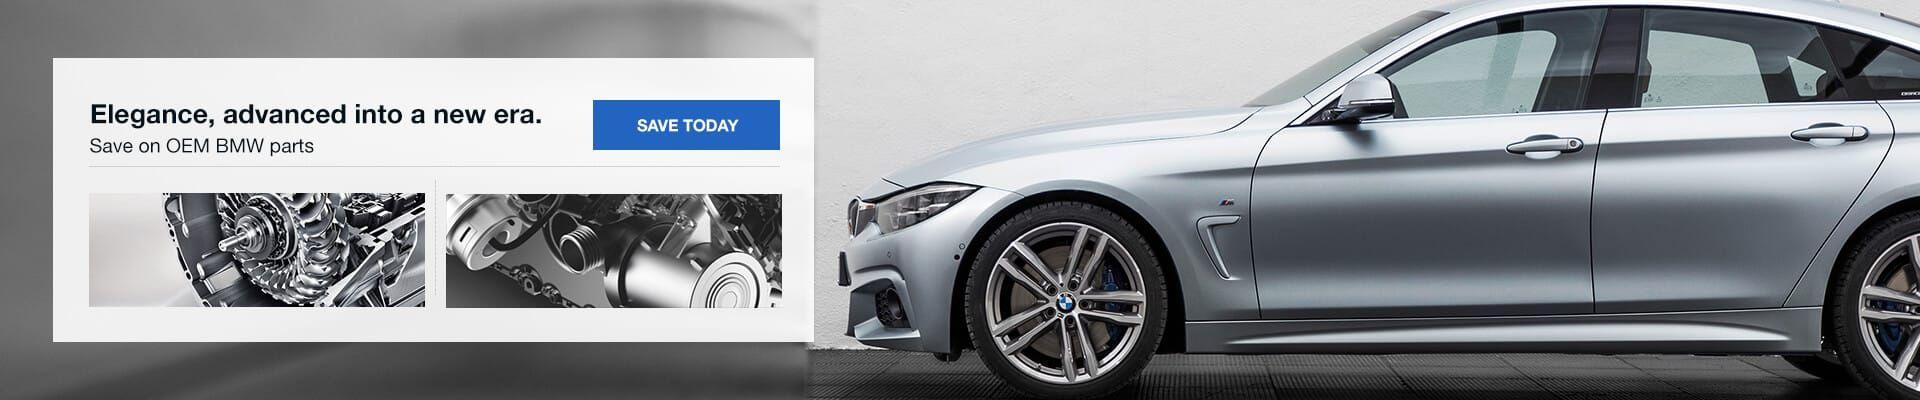 BMW OEM Parts